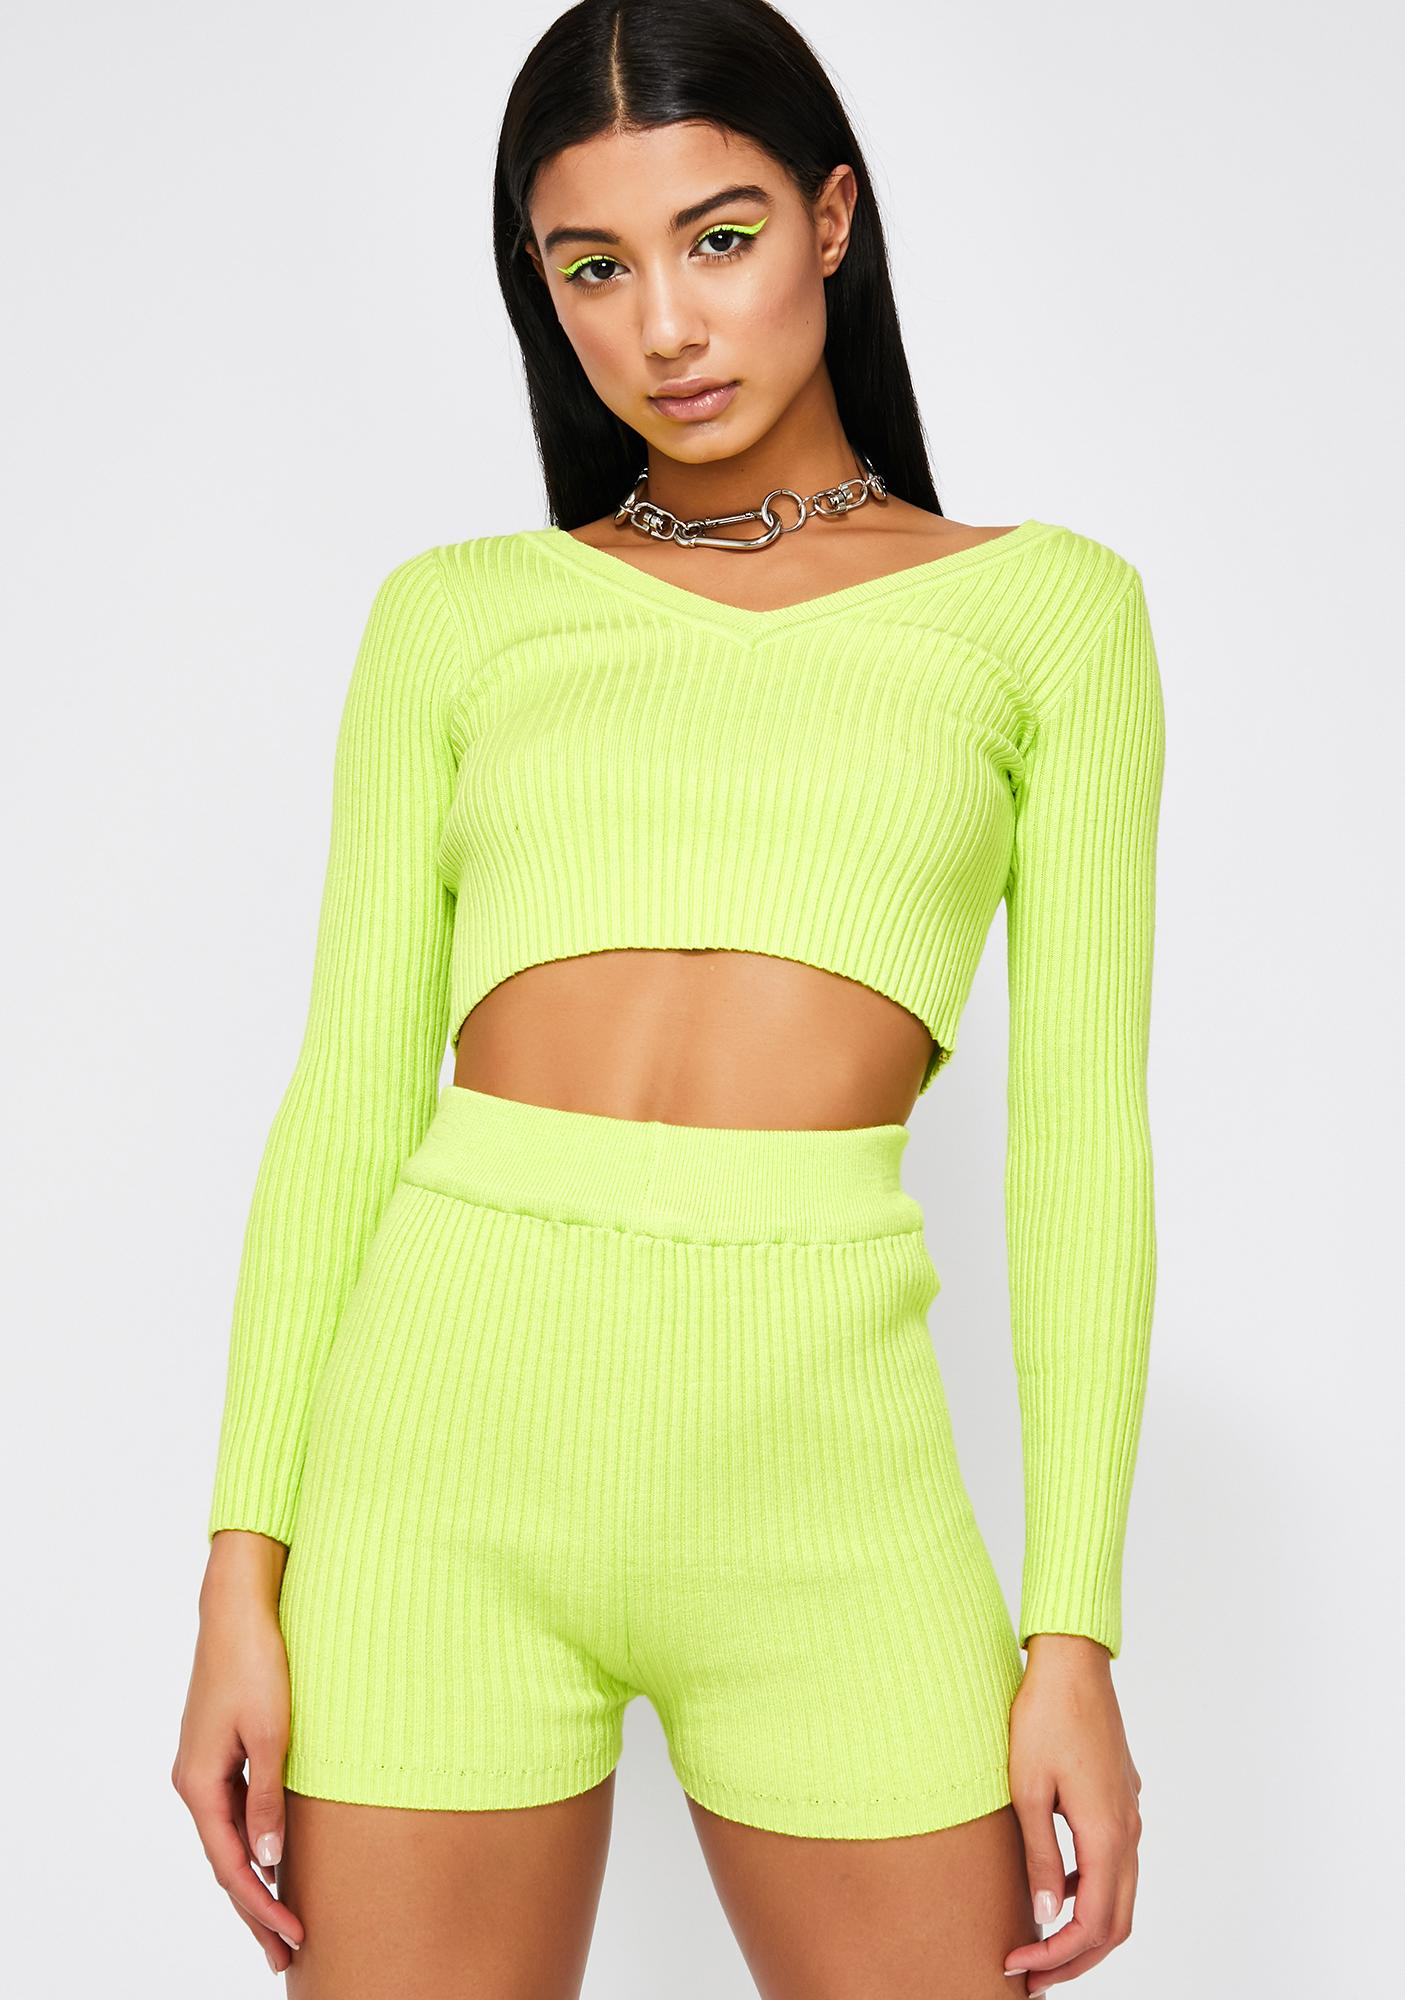 Melrose Avenue Sweater Set